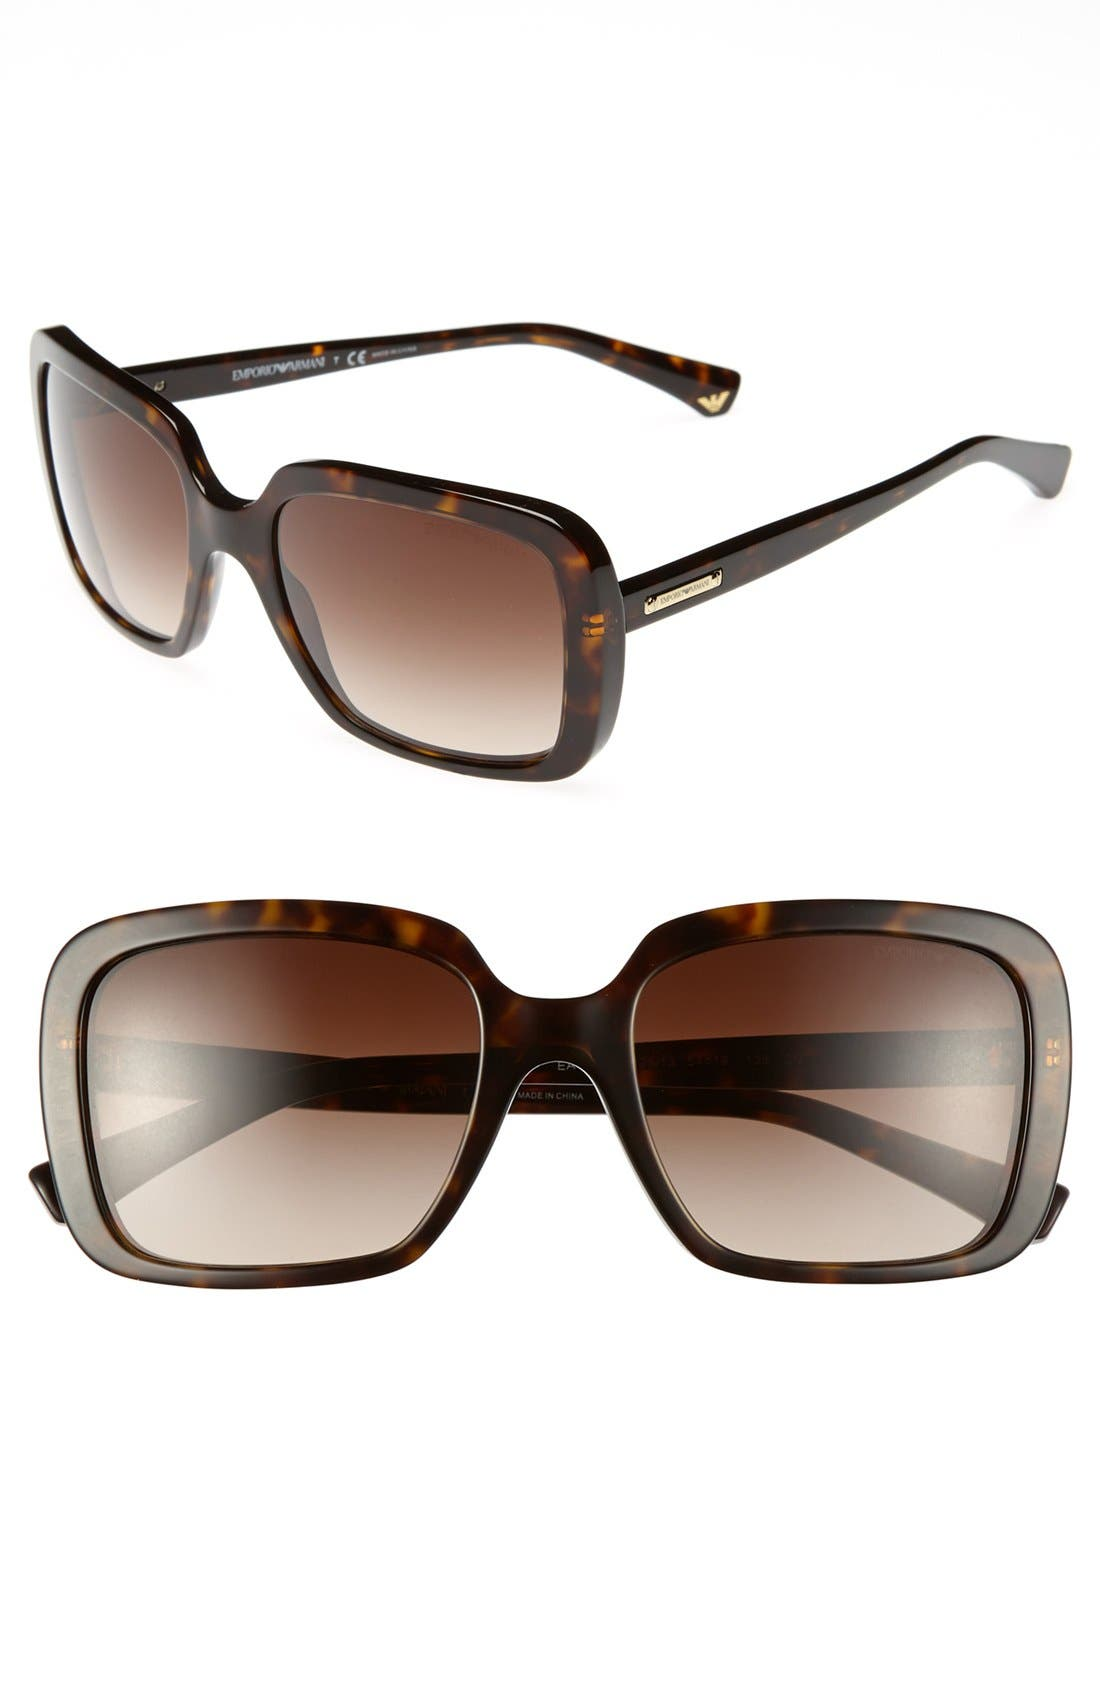 Alternate Image 1 Selected - Emporio Armani 54mm Sunglasses